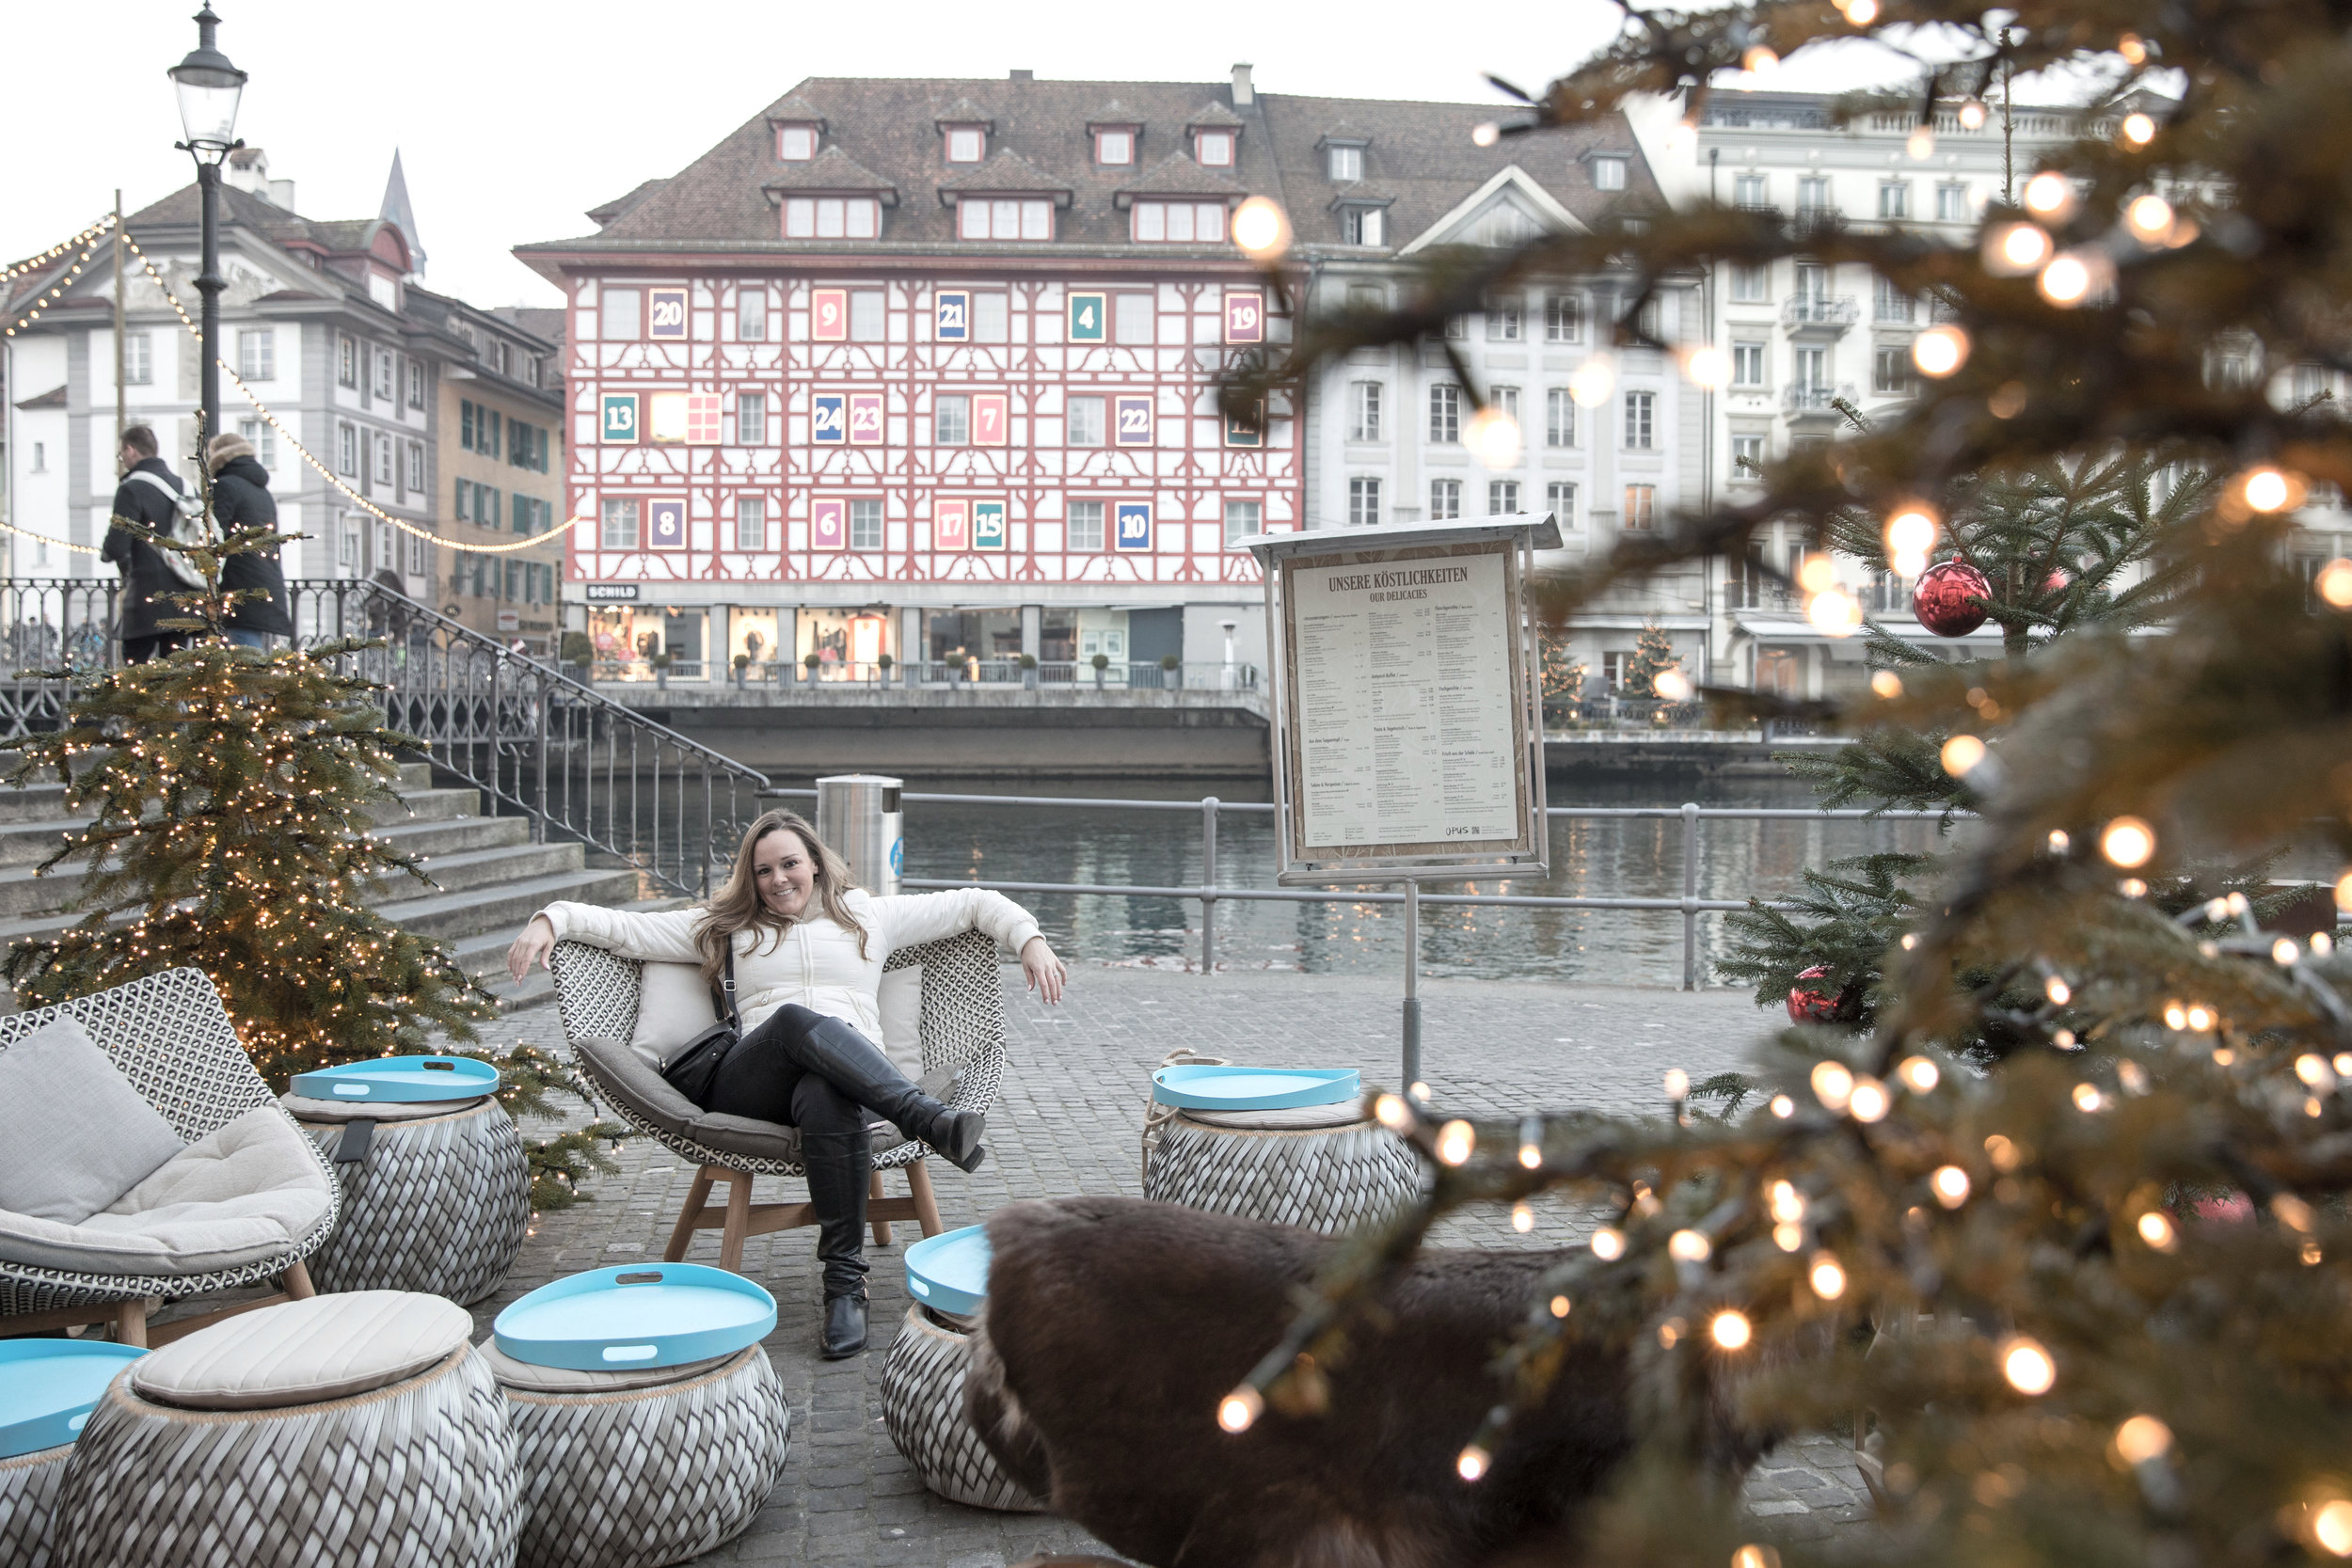 lucerne_christmas_markets_christy_blum.jpg